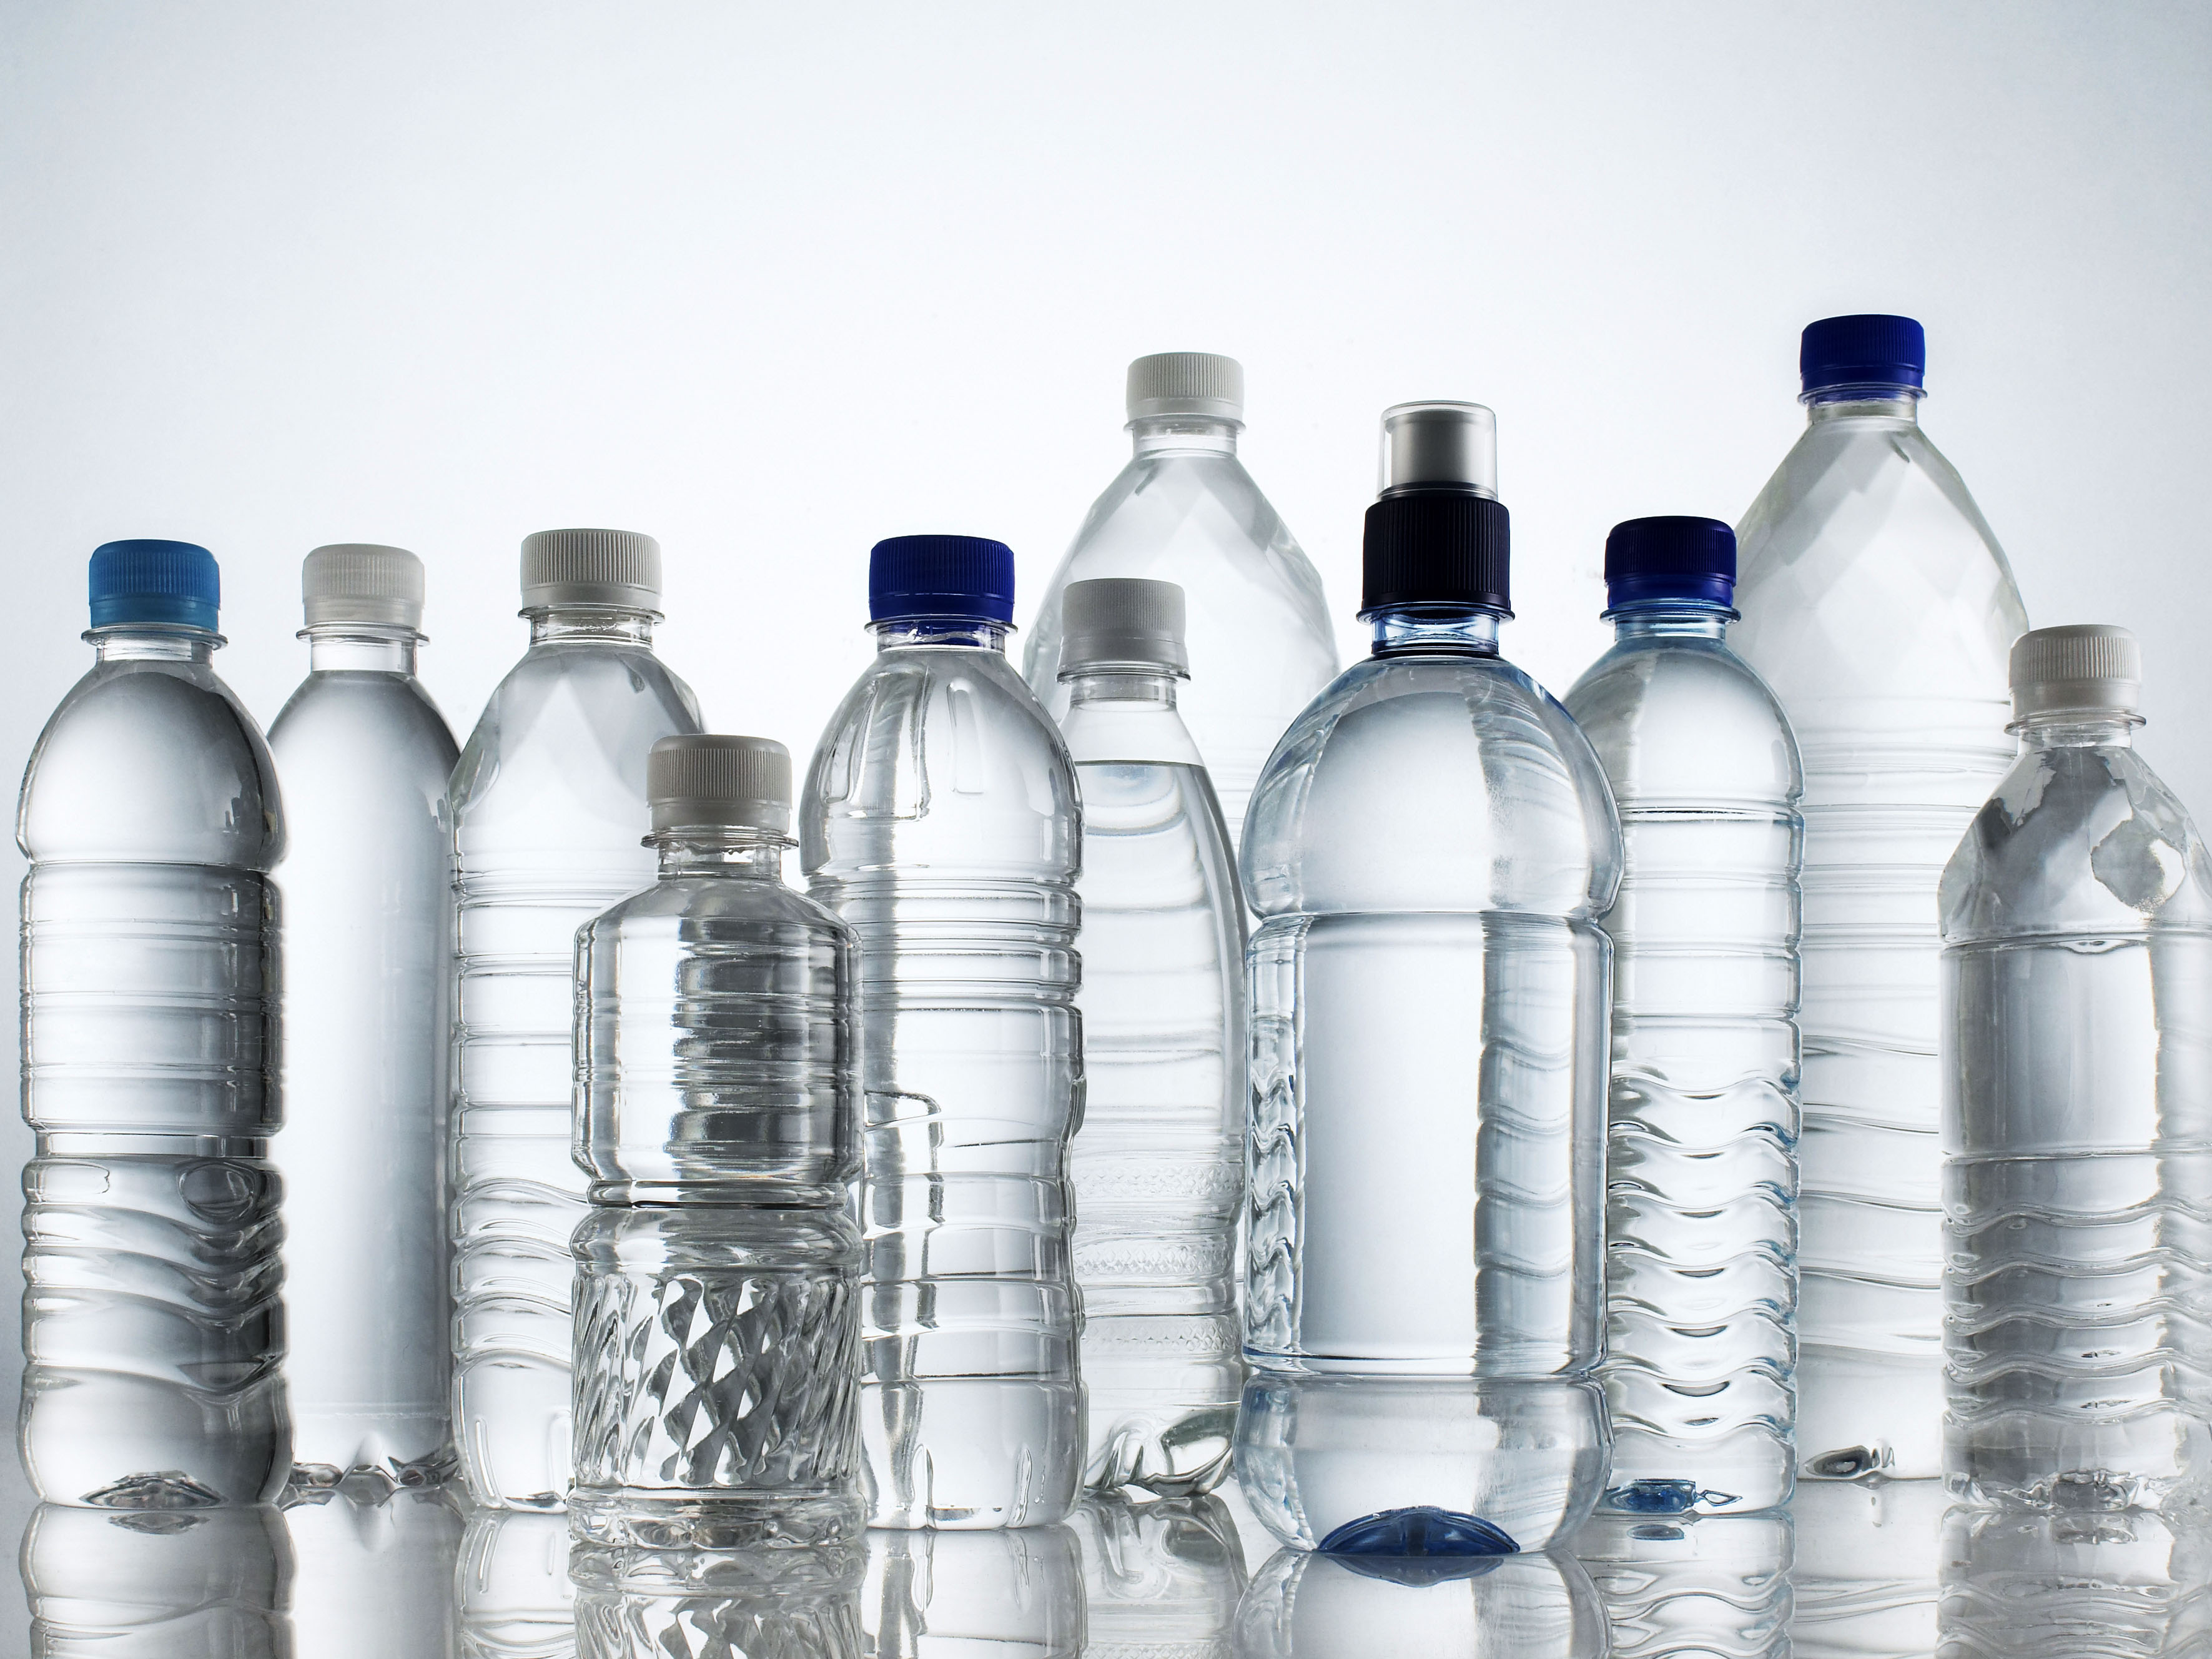 Glass or plastic? Study profiles changing consumer attitudes